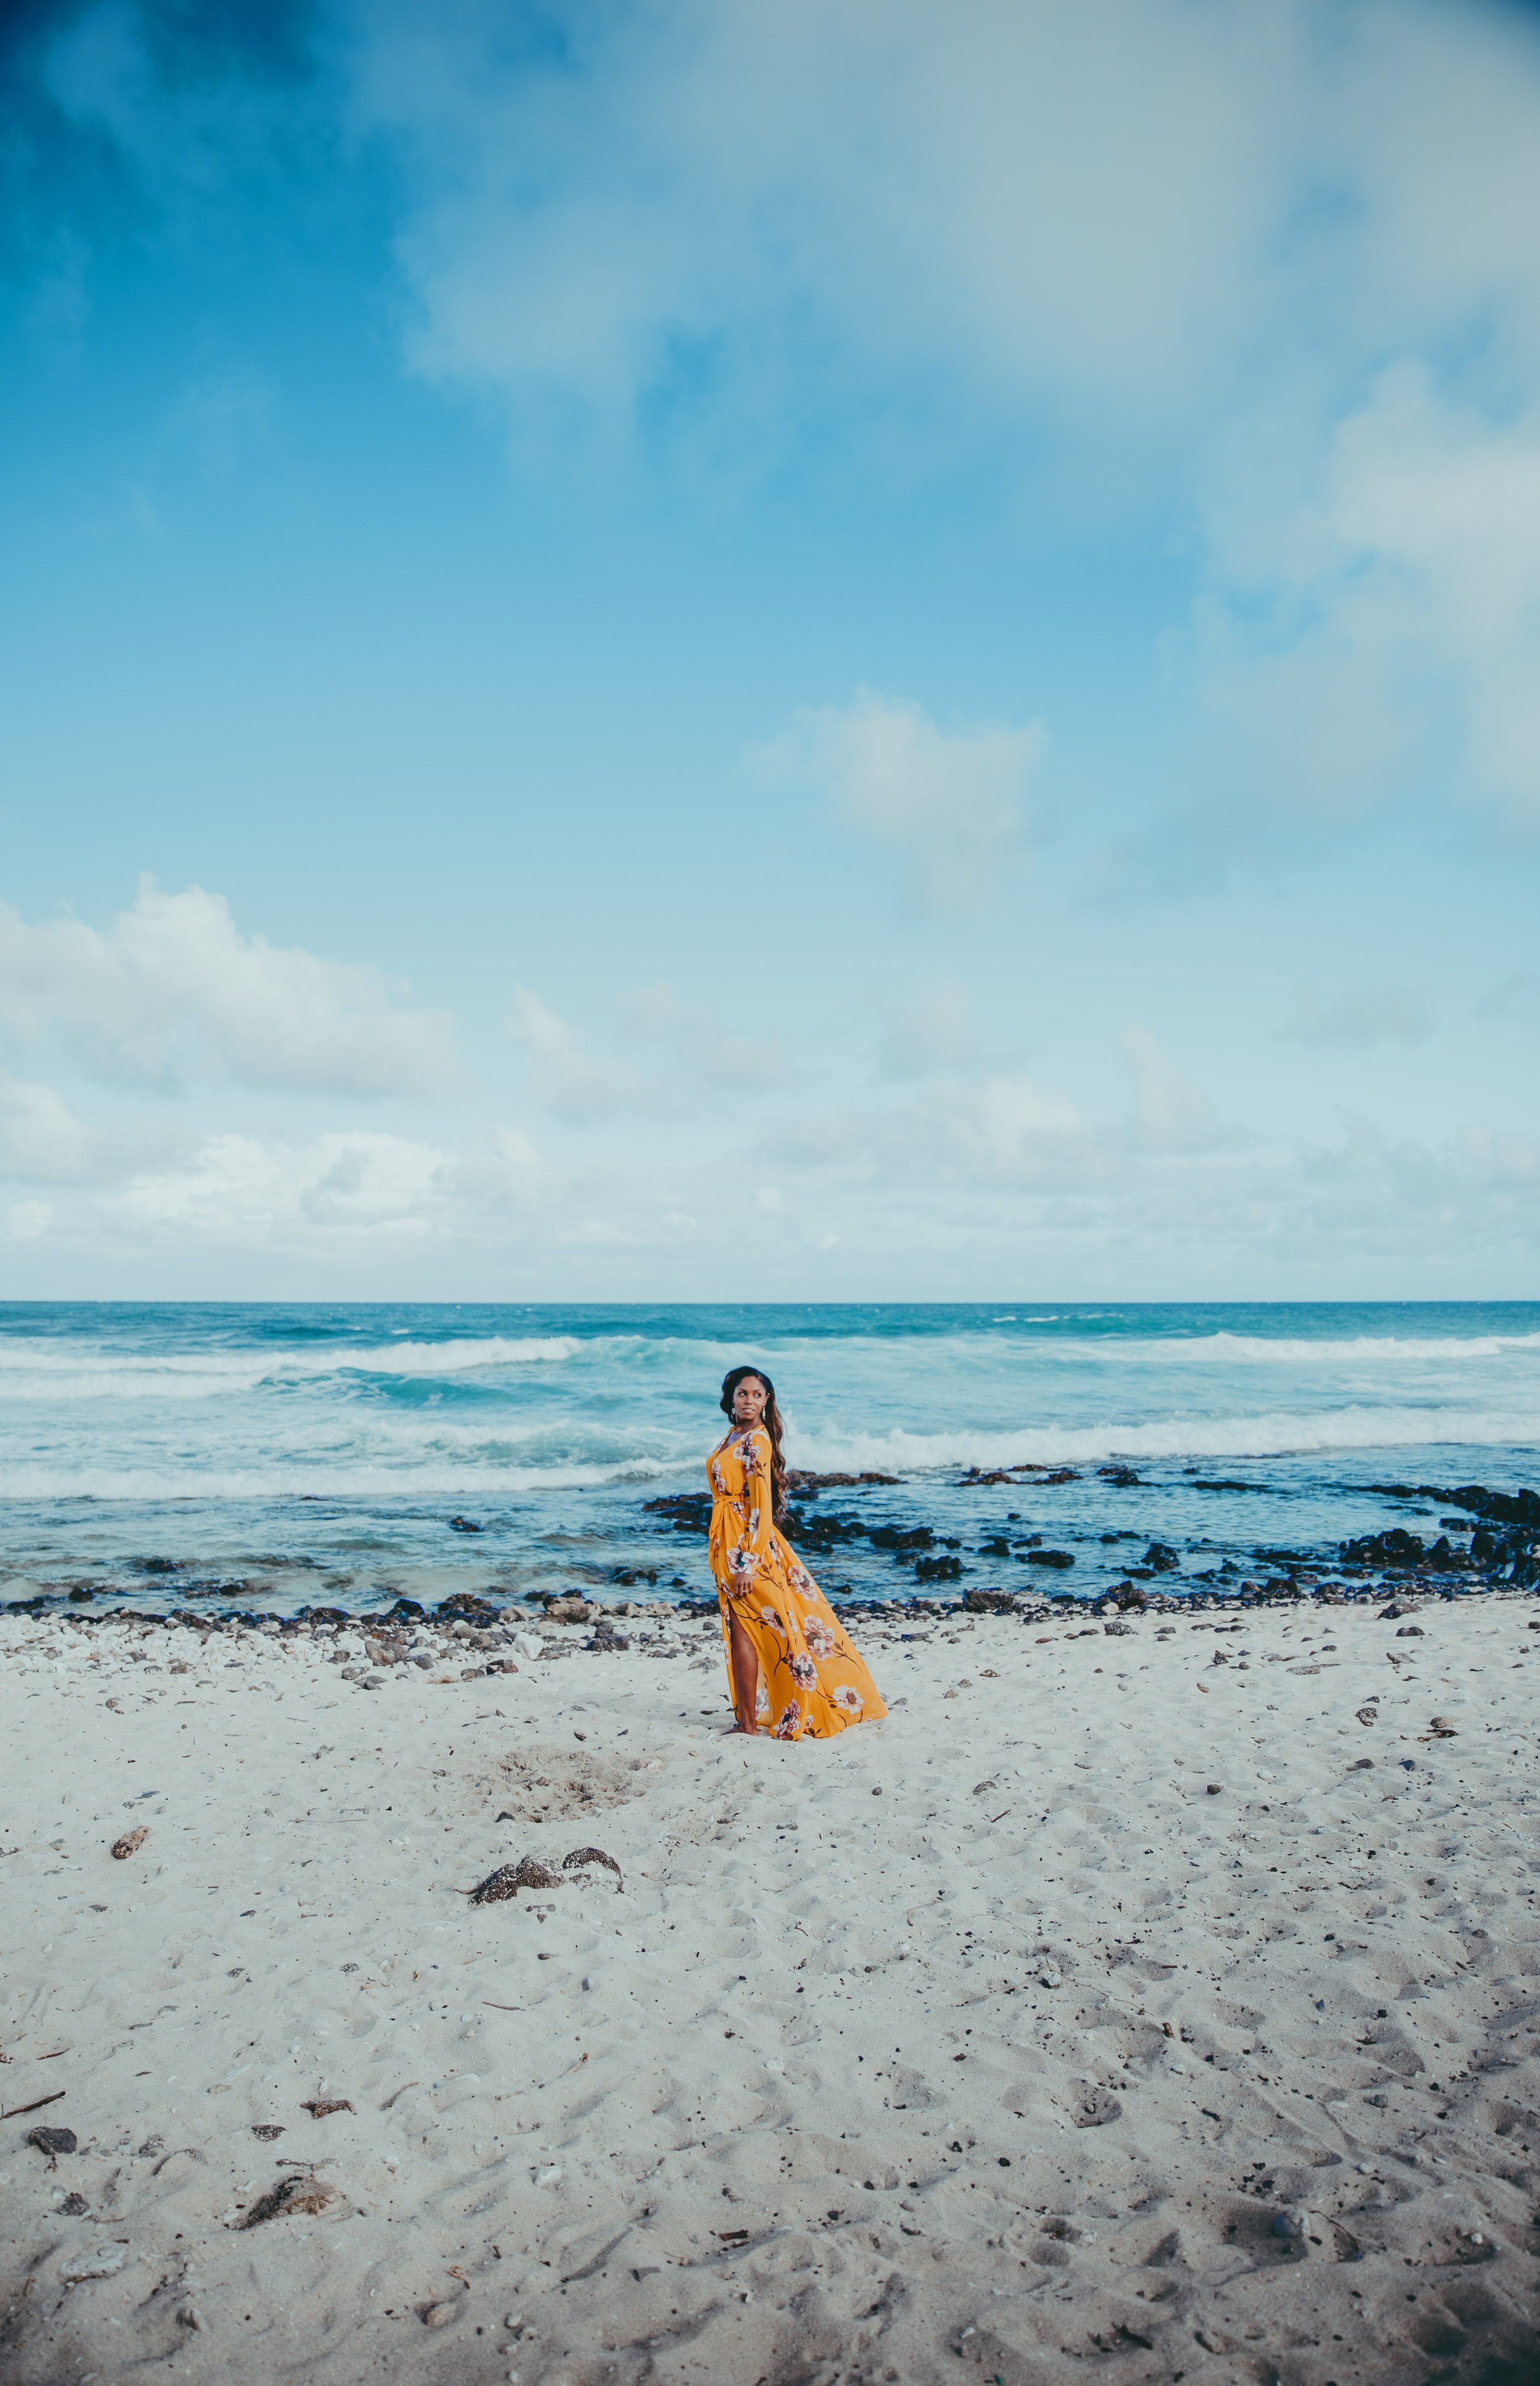 Hawai'i photographer, Oahu photographer, honolulu photographer, genkiphotos, genkimedia, creative photography,wonderlust, Hawaii Nature, Hawaii Sunset, love yourself, Body positivity